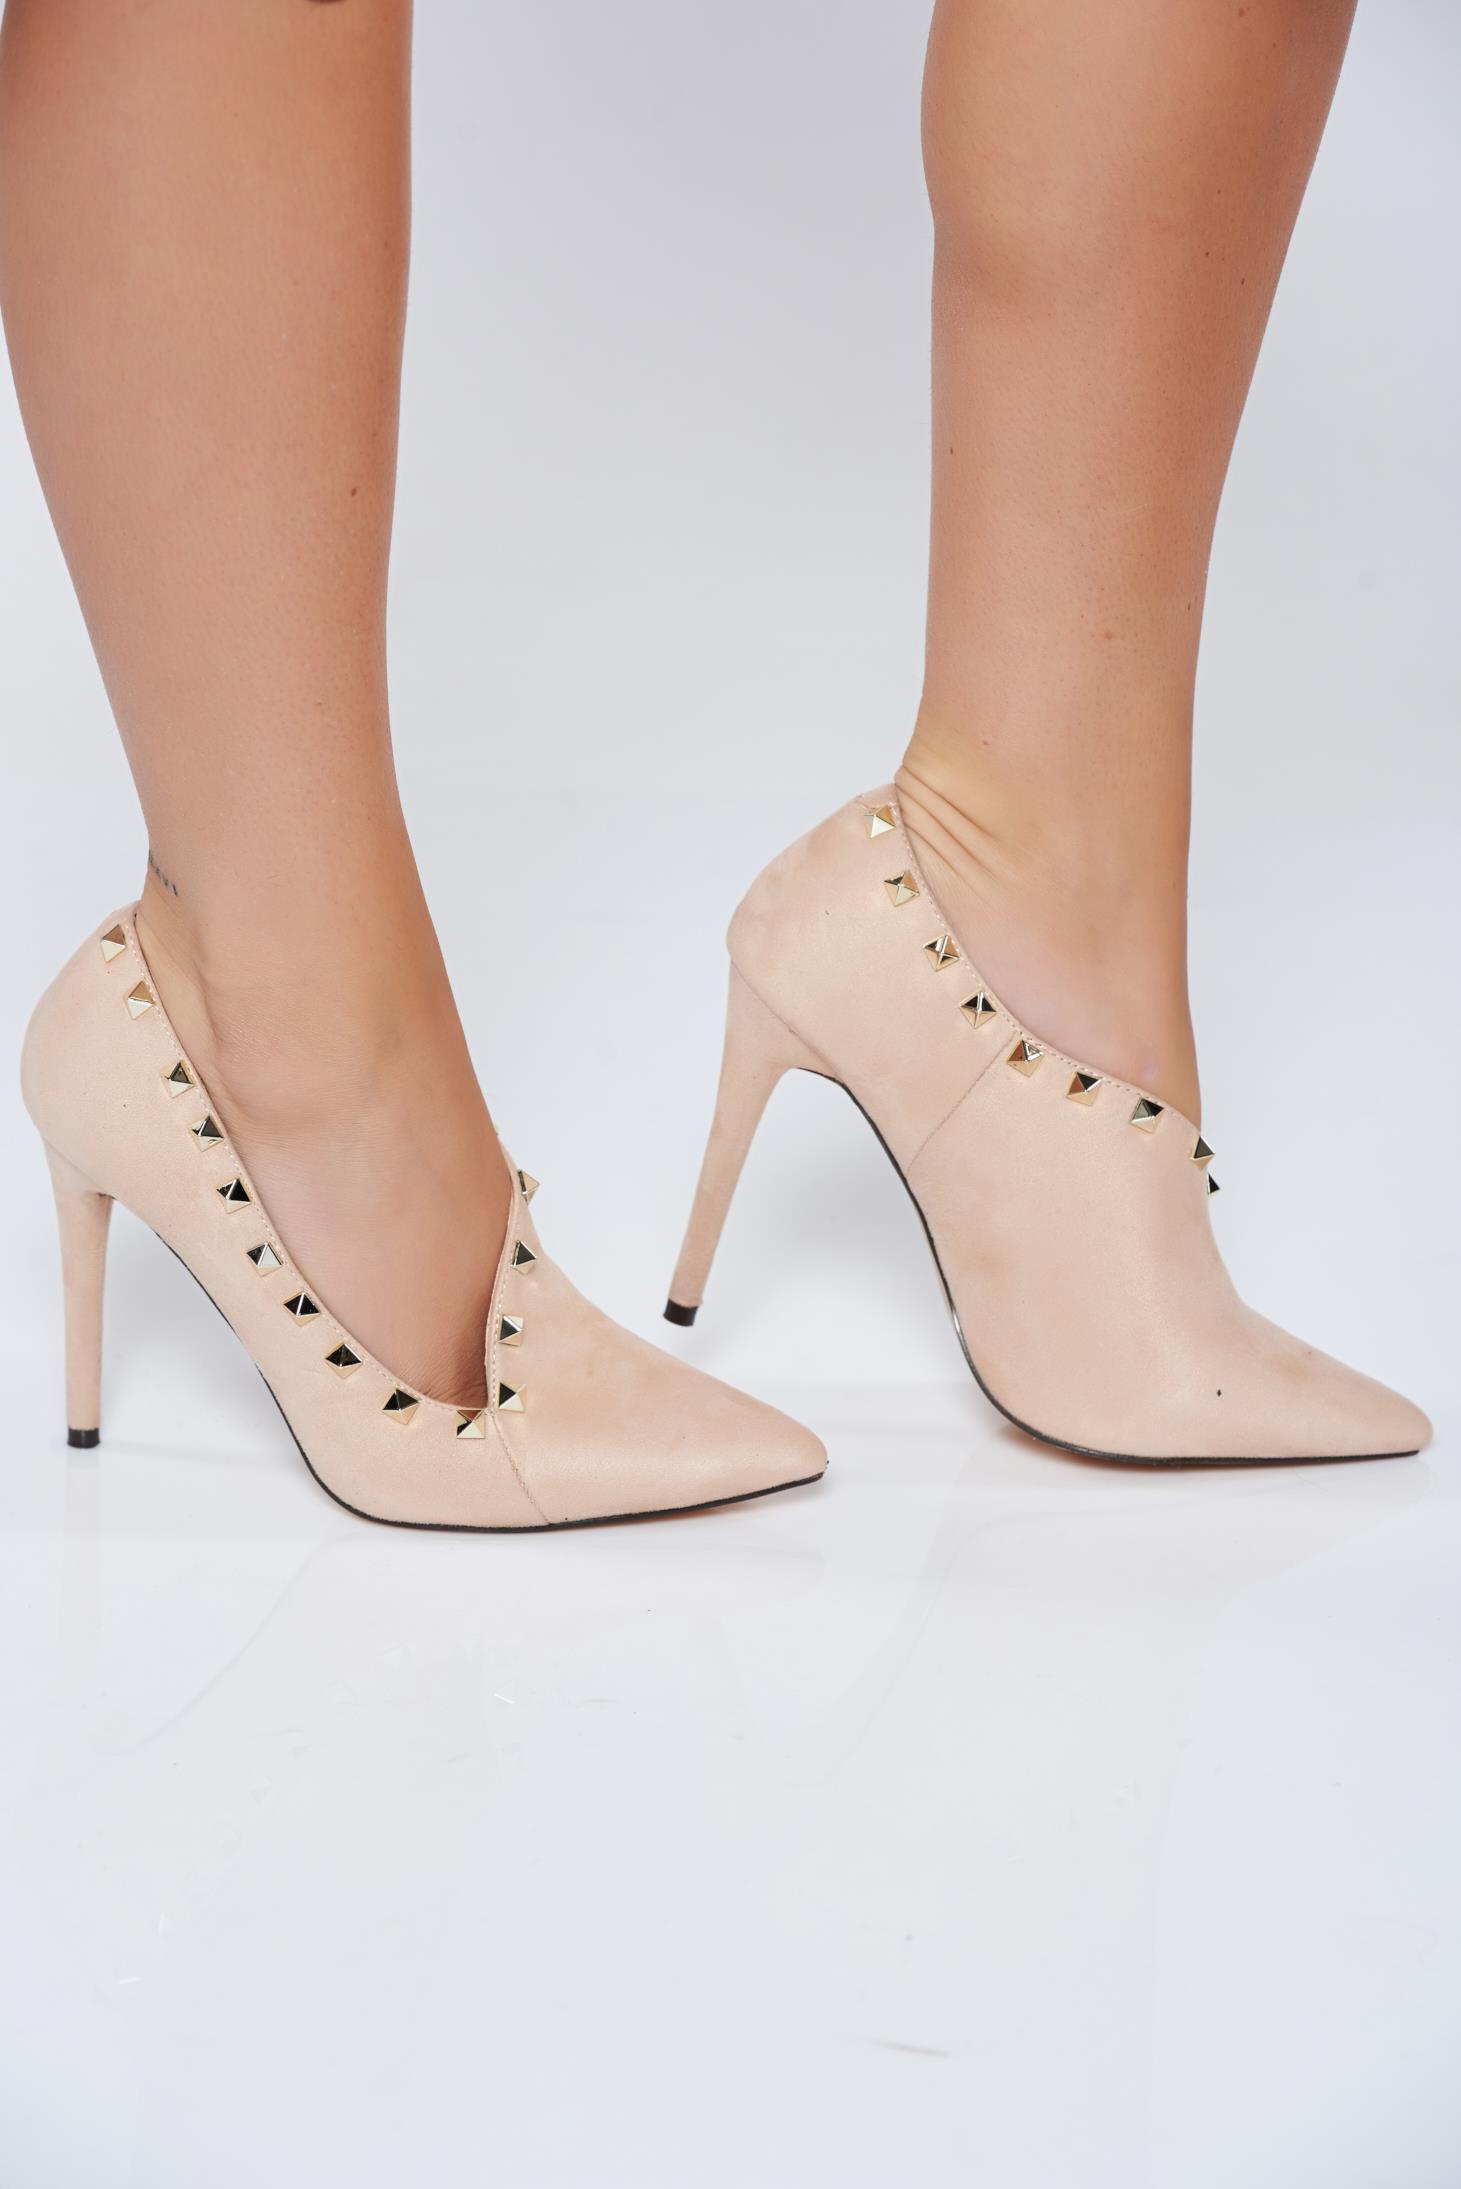 89bb0d87d3db Free shipping Rhinestone Peep Toe Waterproof women high heels cream sole  shoes Women s Pumps mix order-in Women s Pumps from Shoes on Aliexpress.com  …